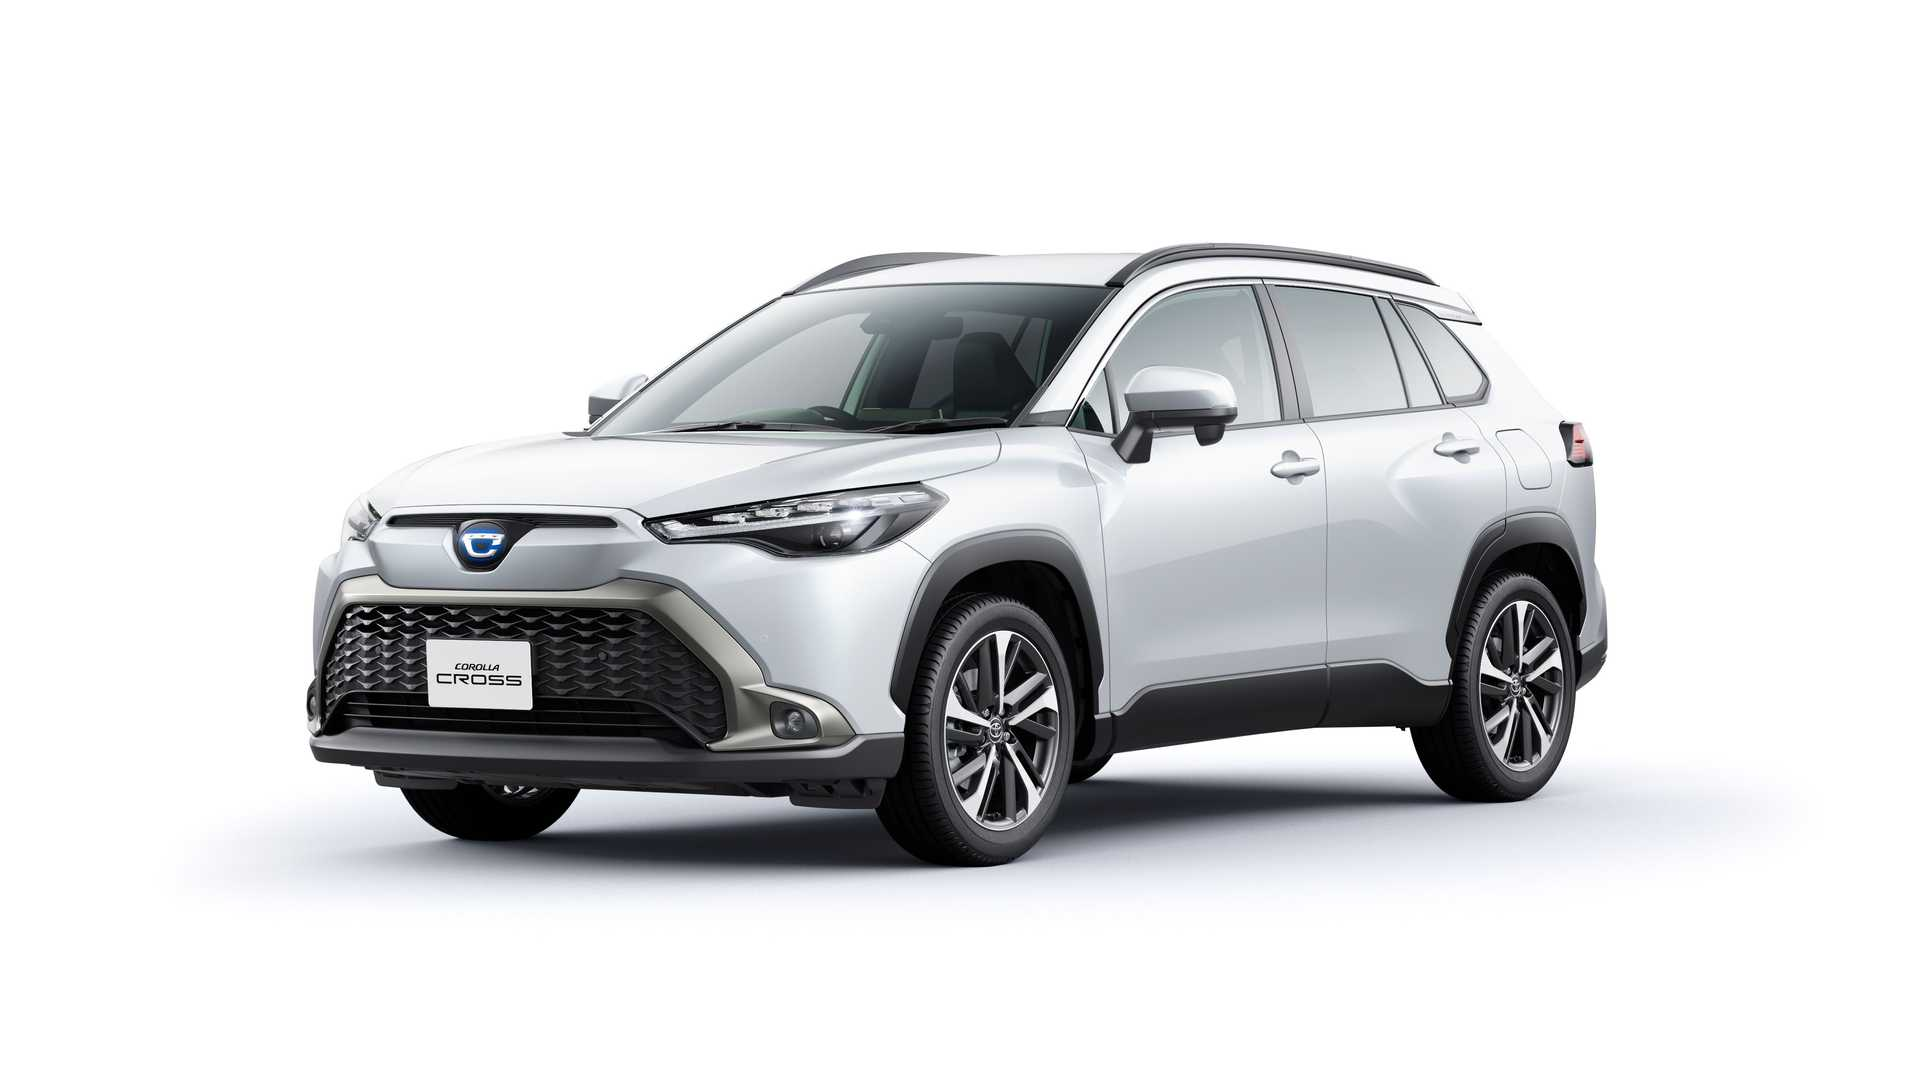 2022 Toyota Corolla Cross (JDM)